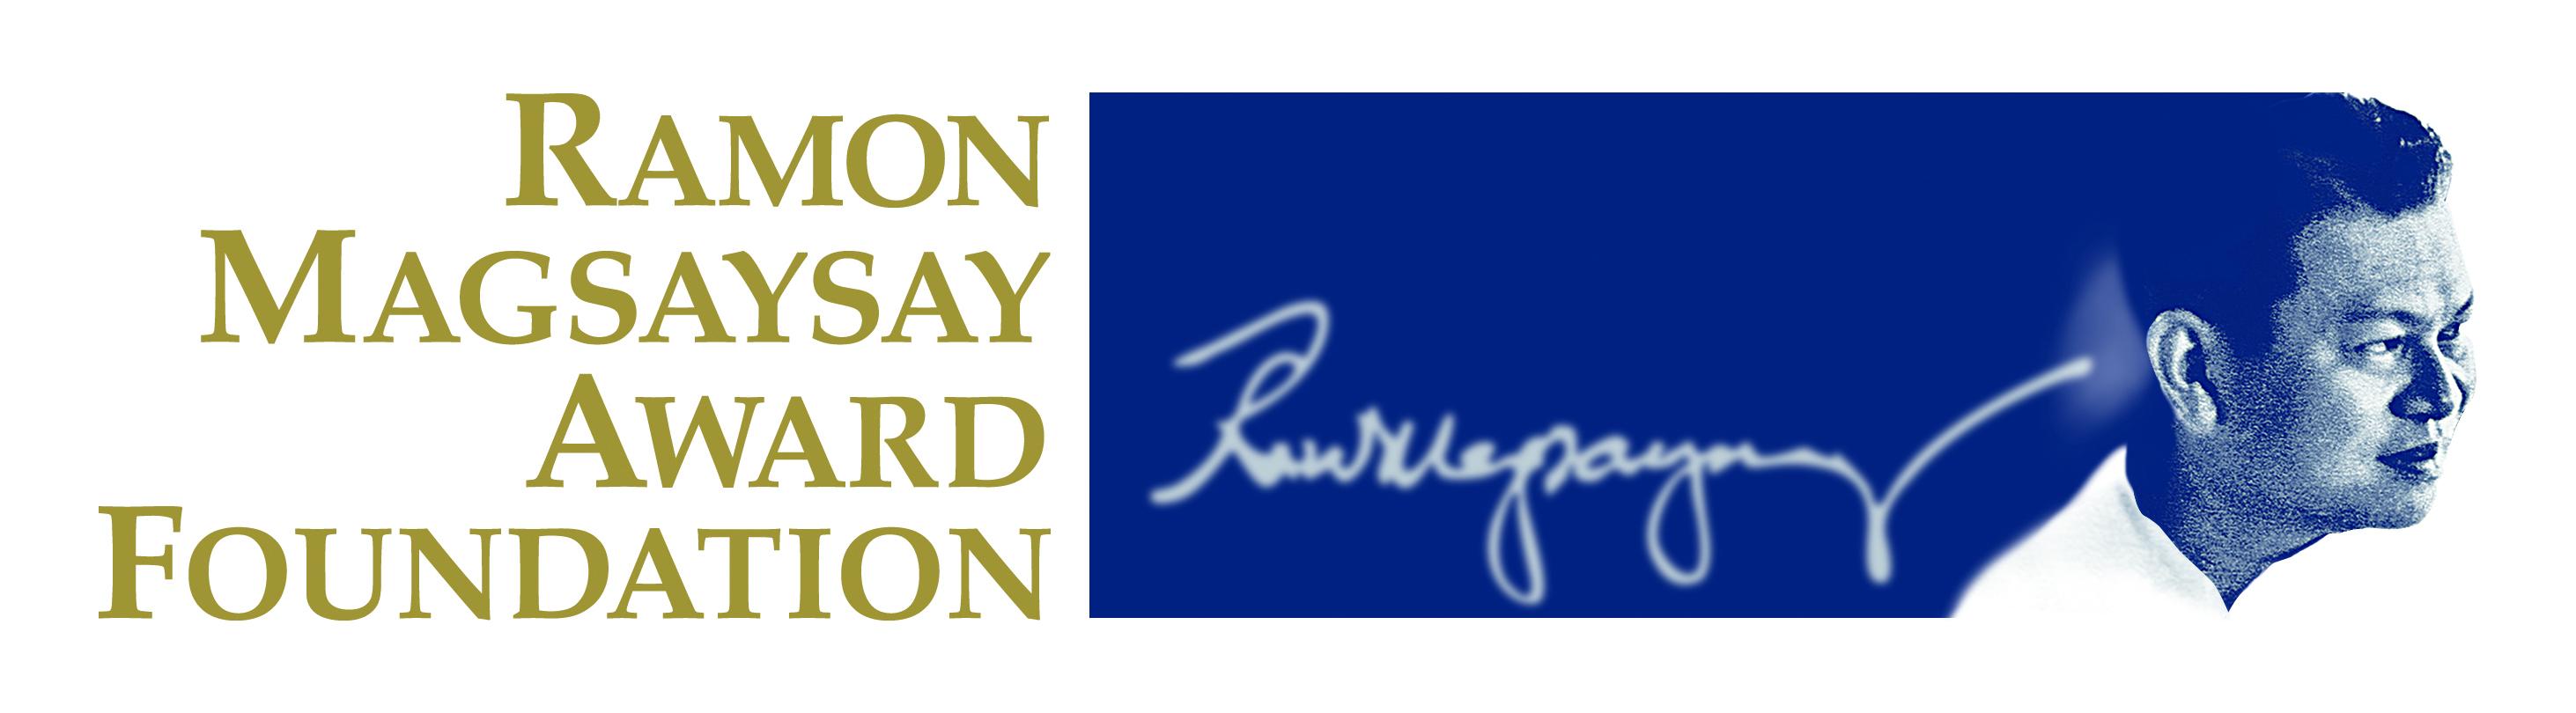 ramon-magsaysay-award-foundation-inc